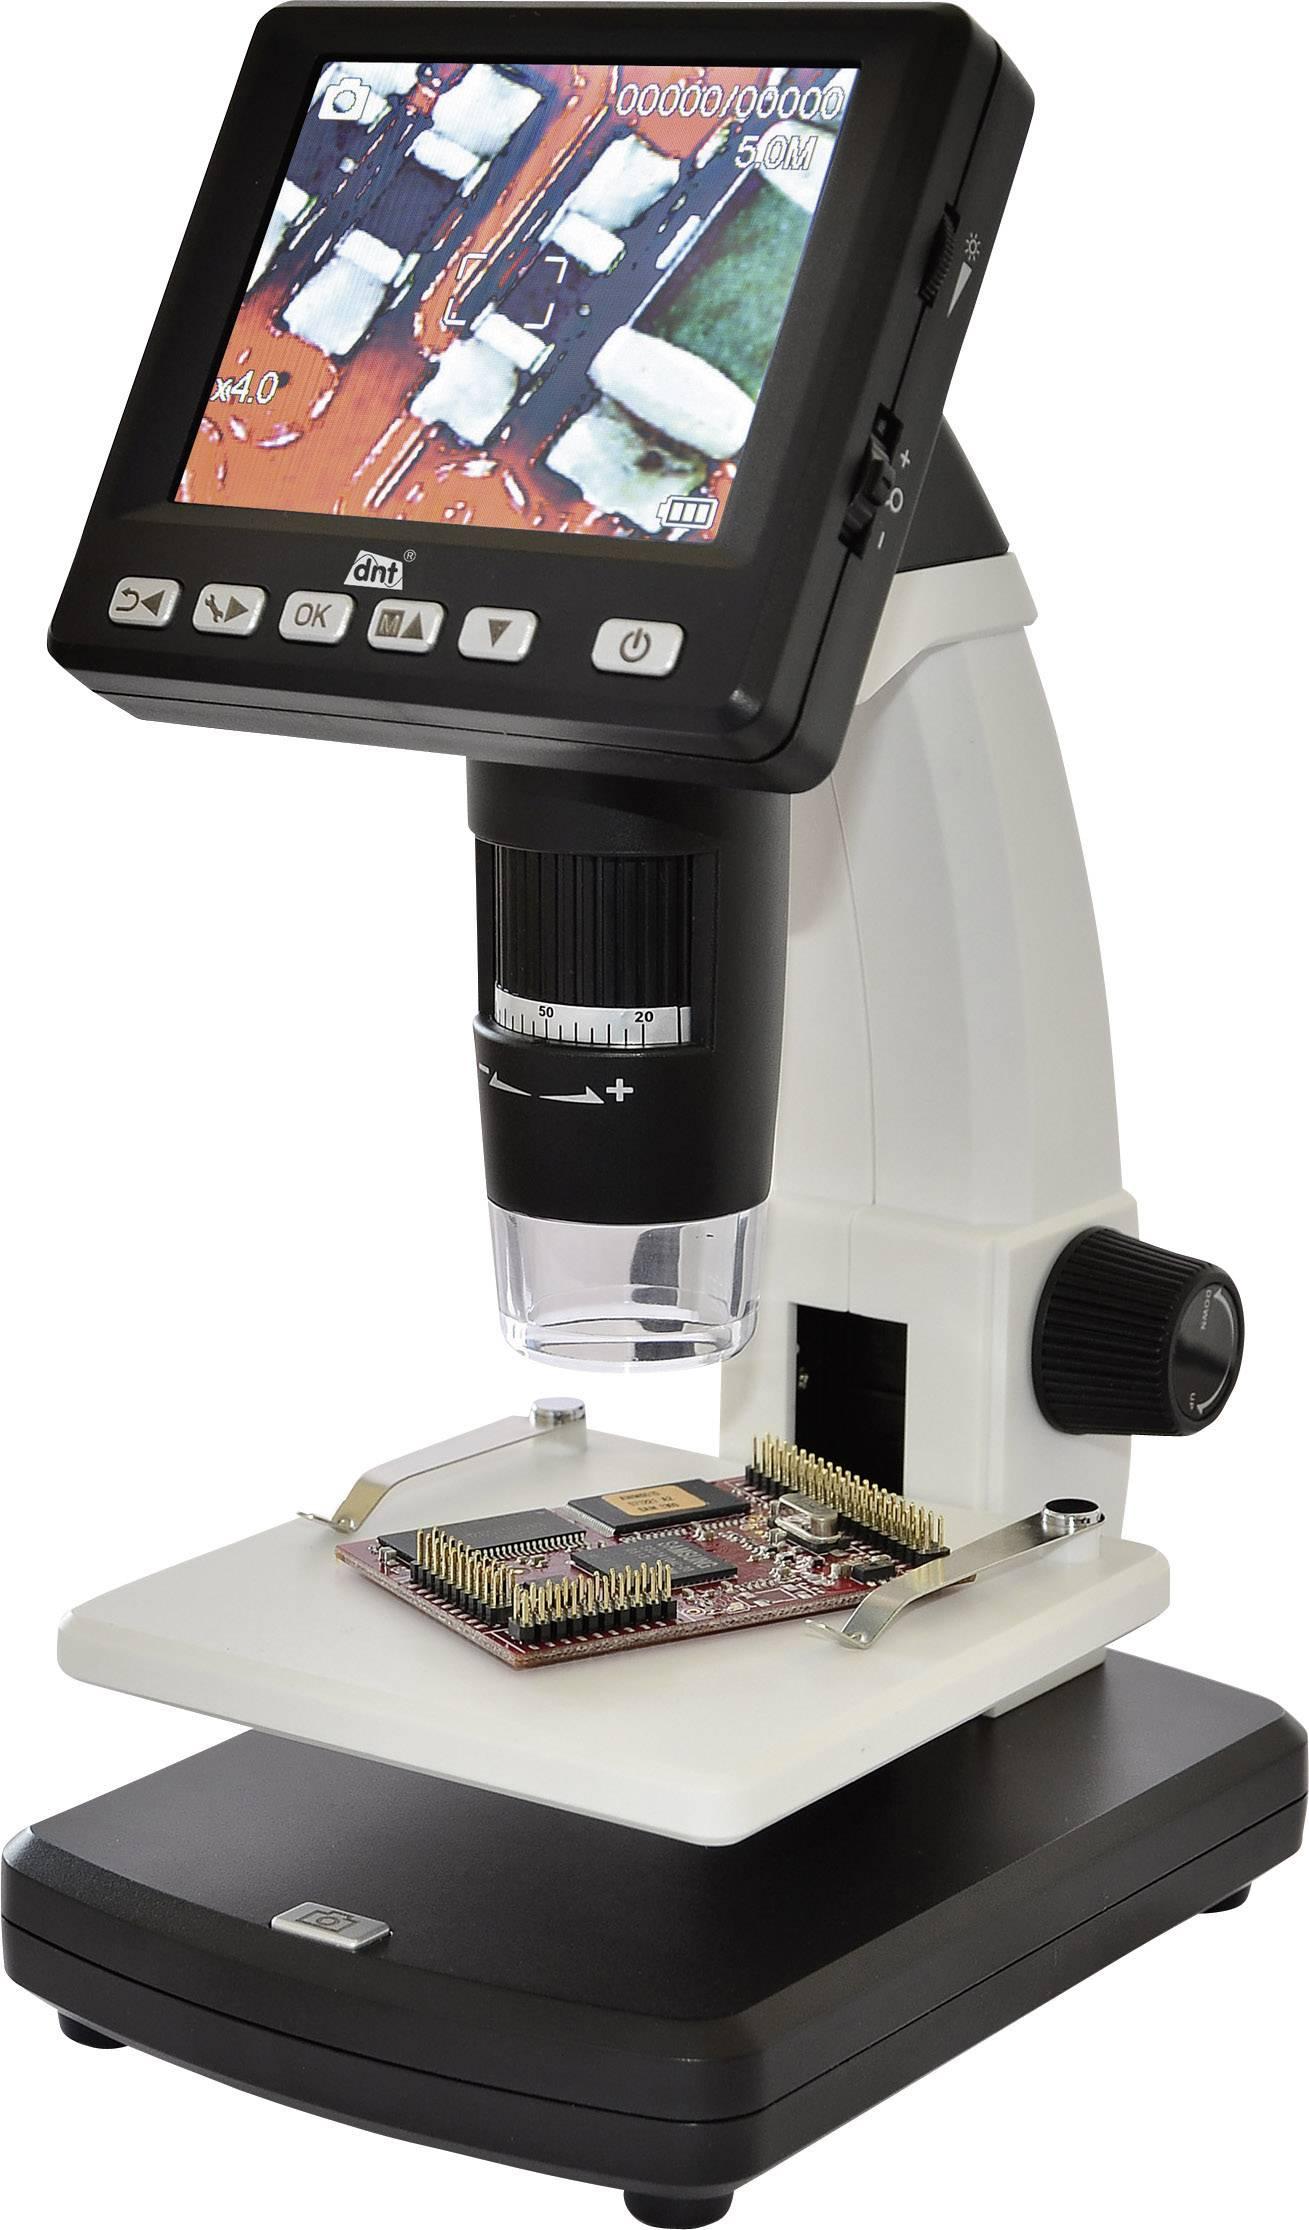 Mikroskopová USB kamera dnt DigiMicro Lab 5.0, 5 Mpx, 20 až 500 x